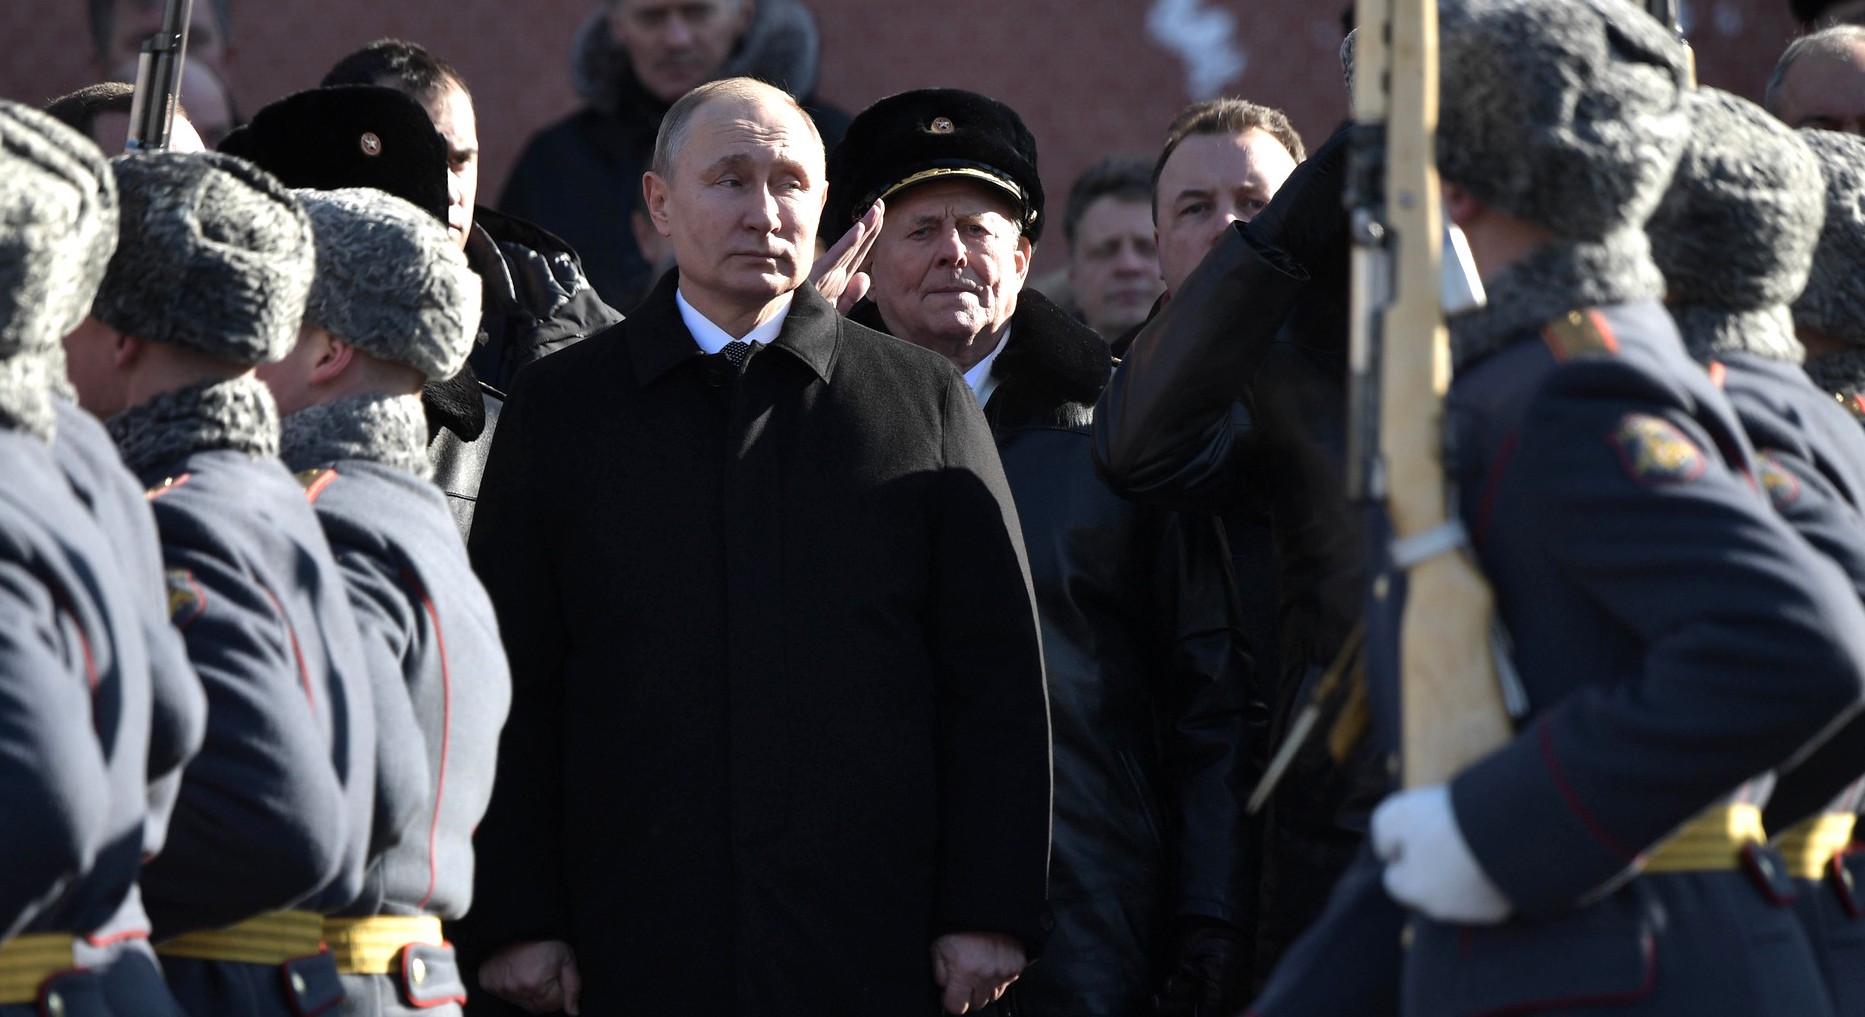 Vladimir Putin at a ceremony in Moscow last week (Photo: Kremlin.ru)